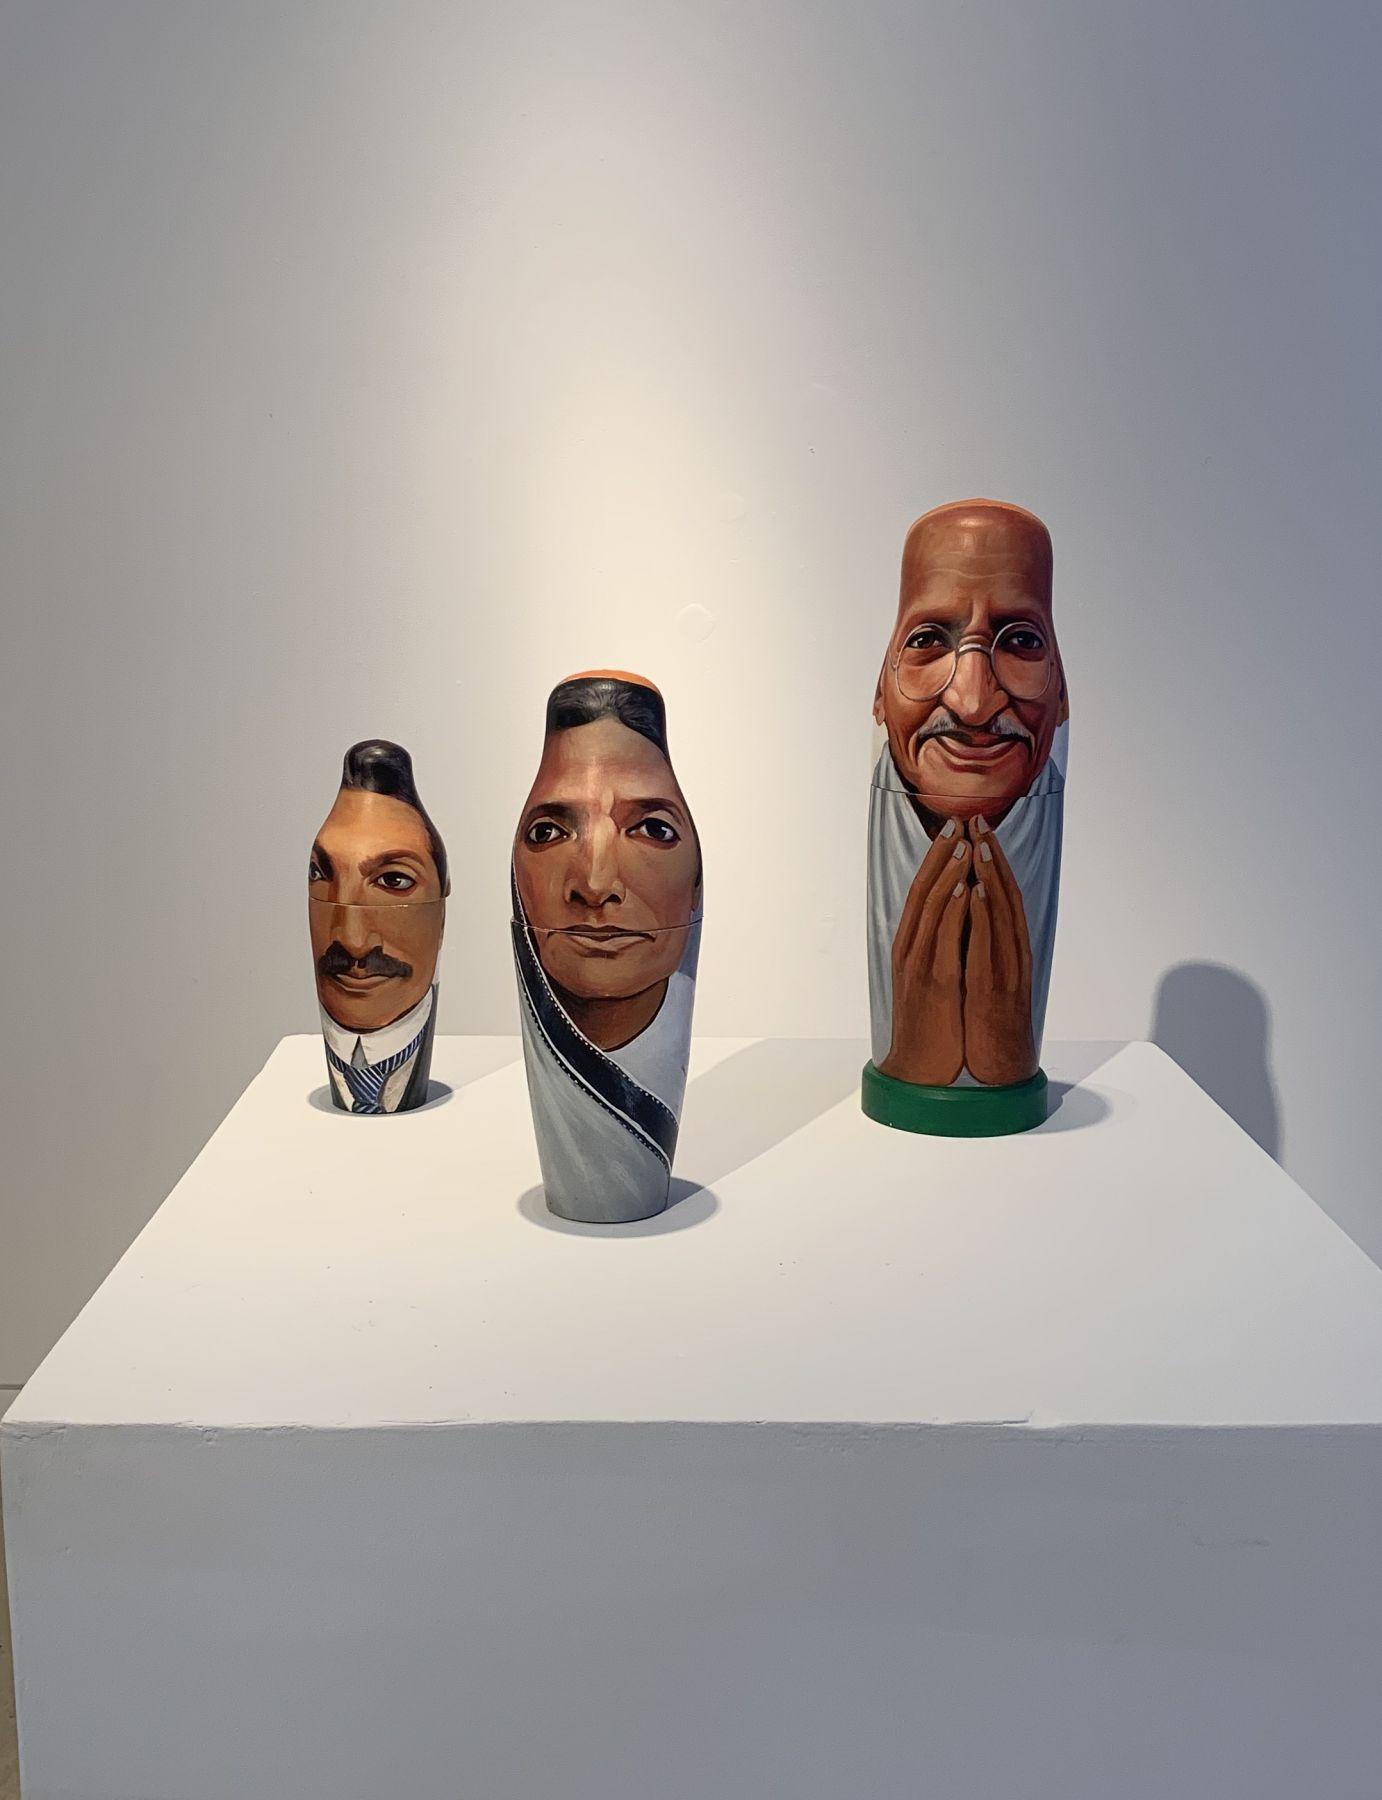 Toy Gandhi 2 (Small Russian Dolls)